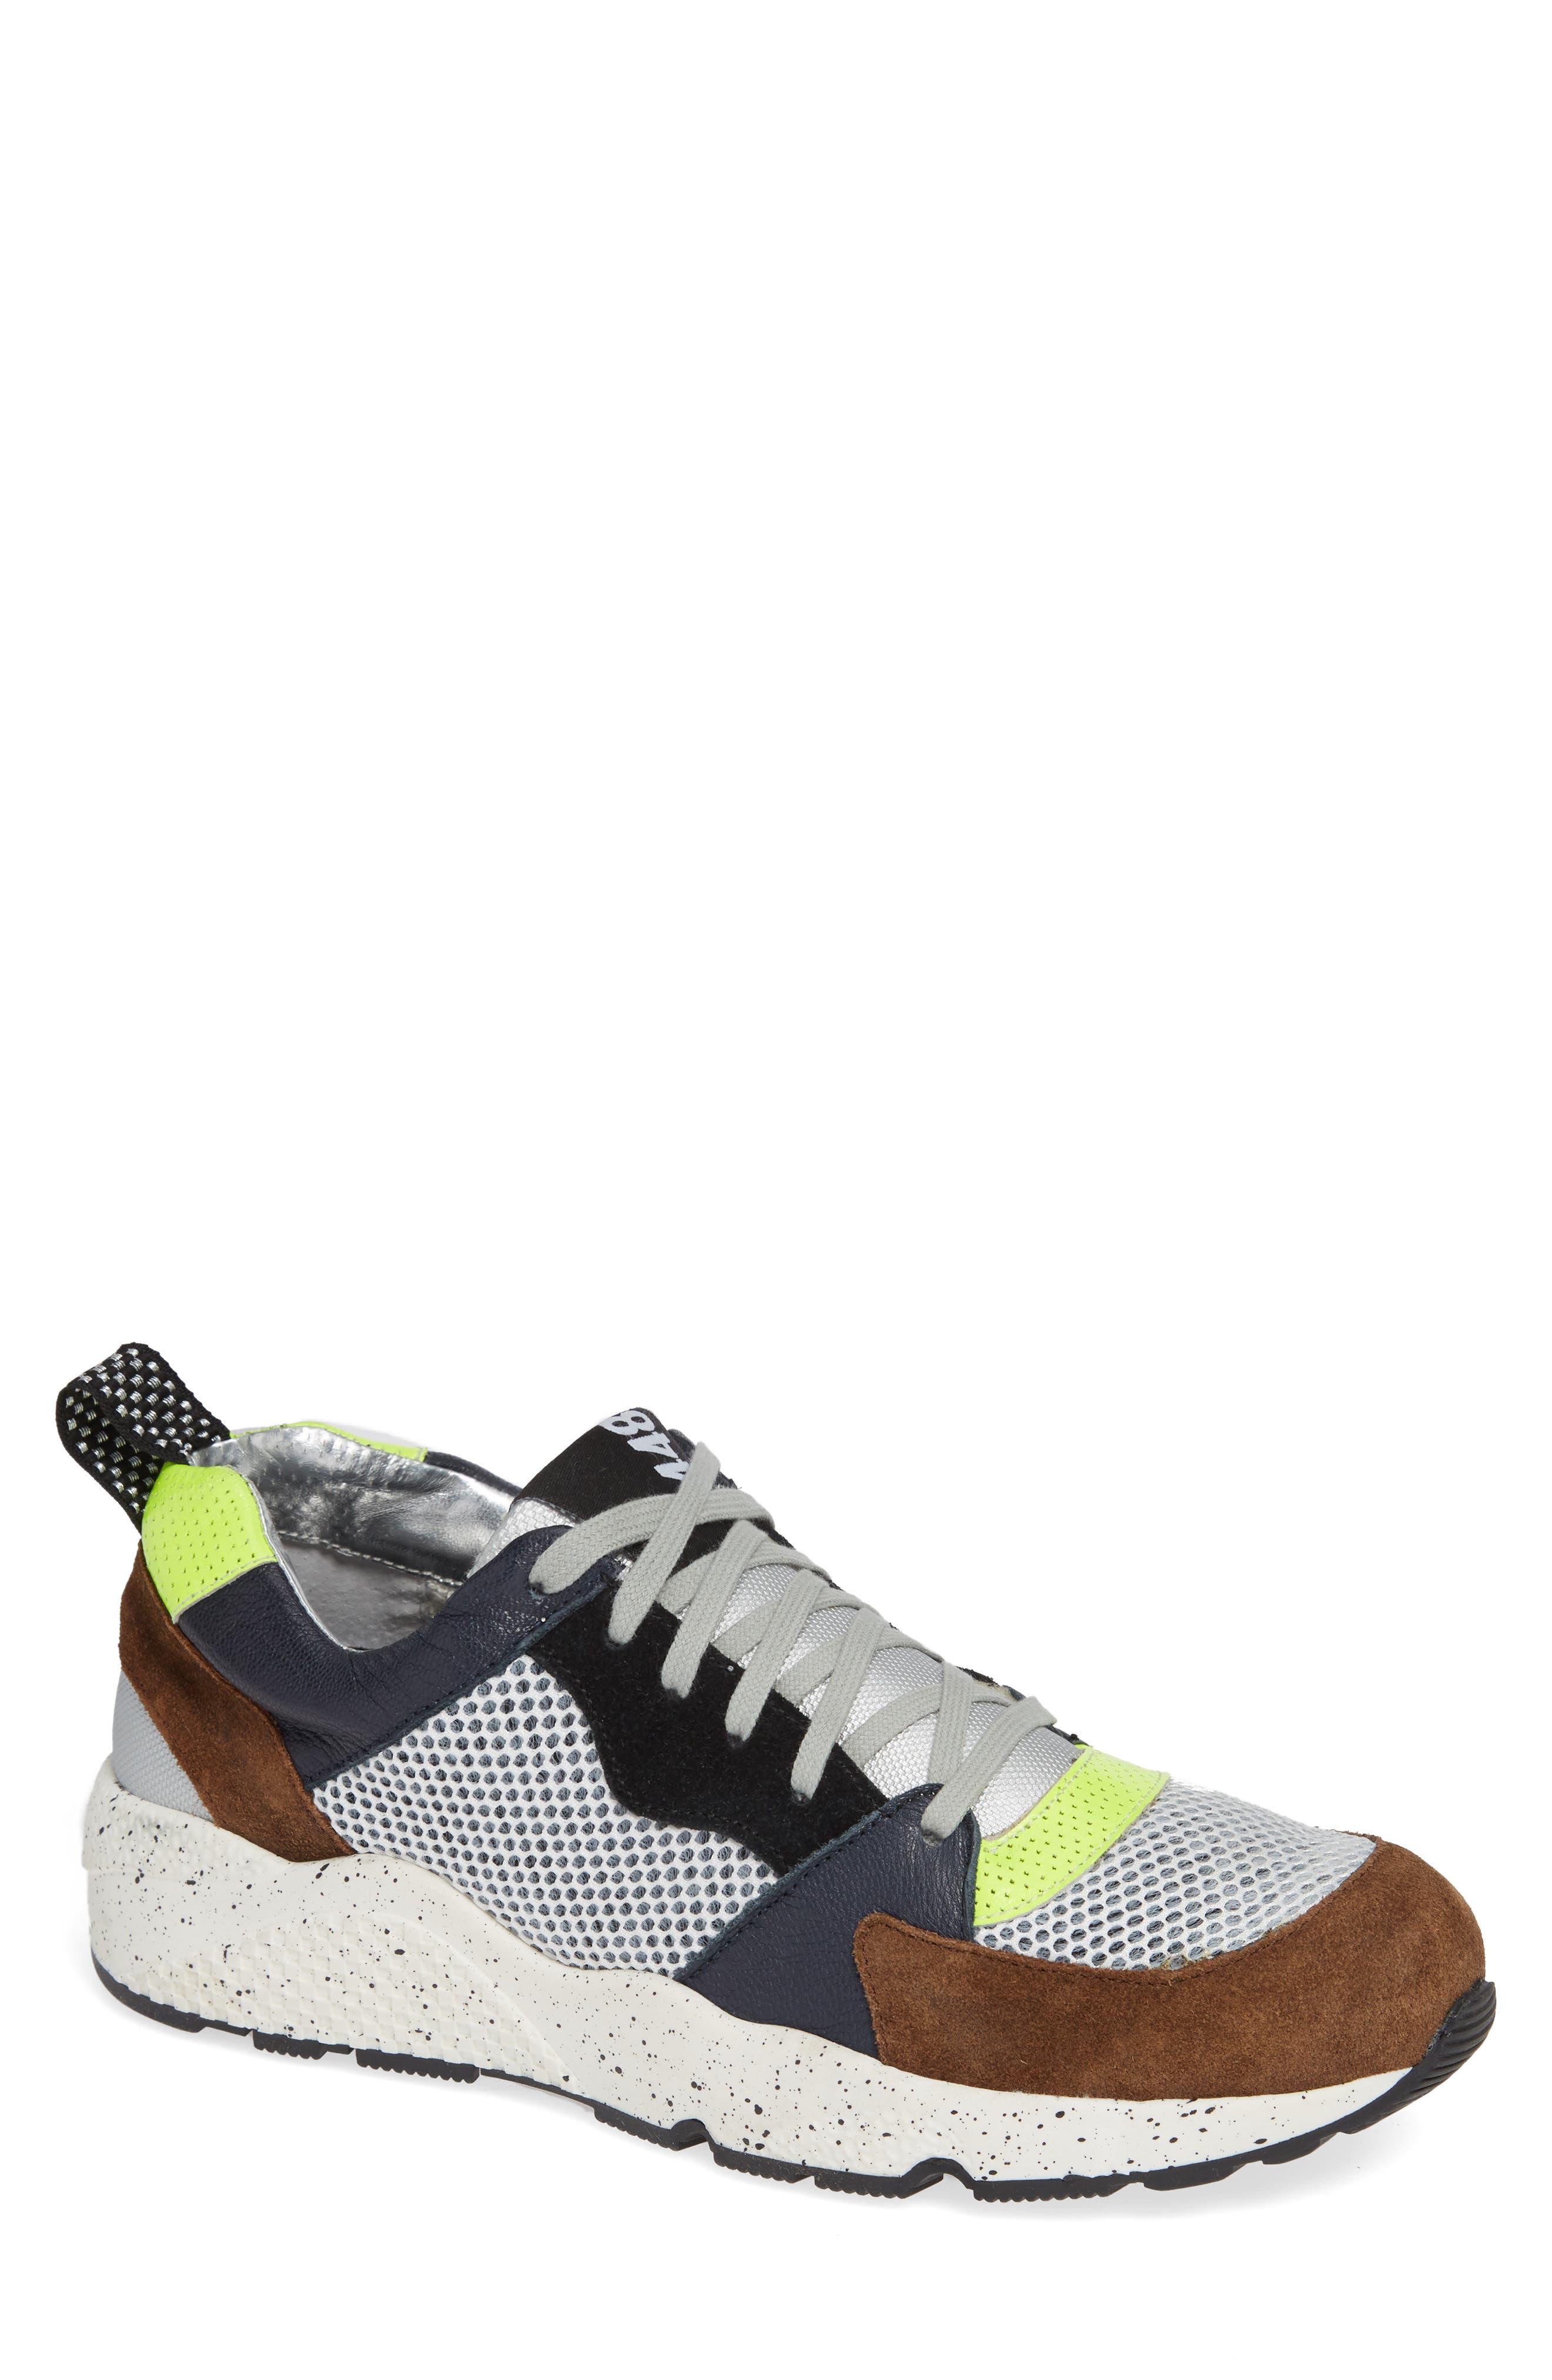 P448 A8Alex Sneaker, Main, color, YELLOW